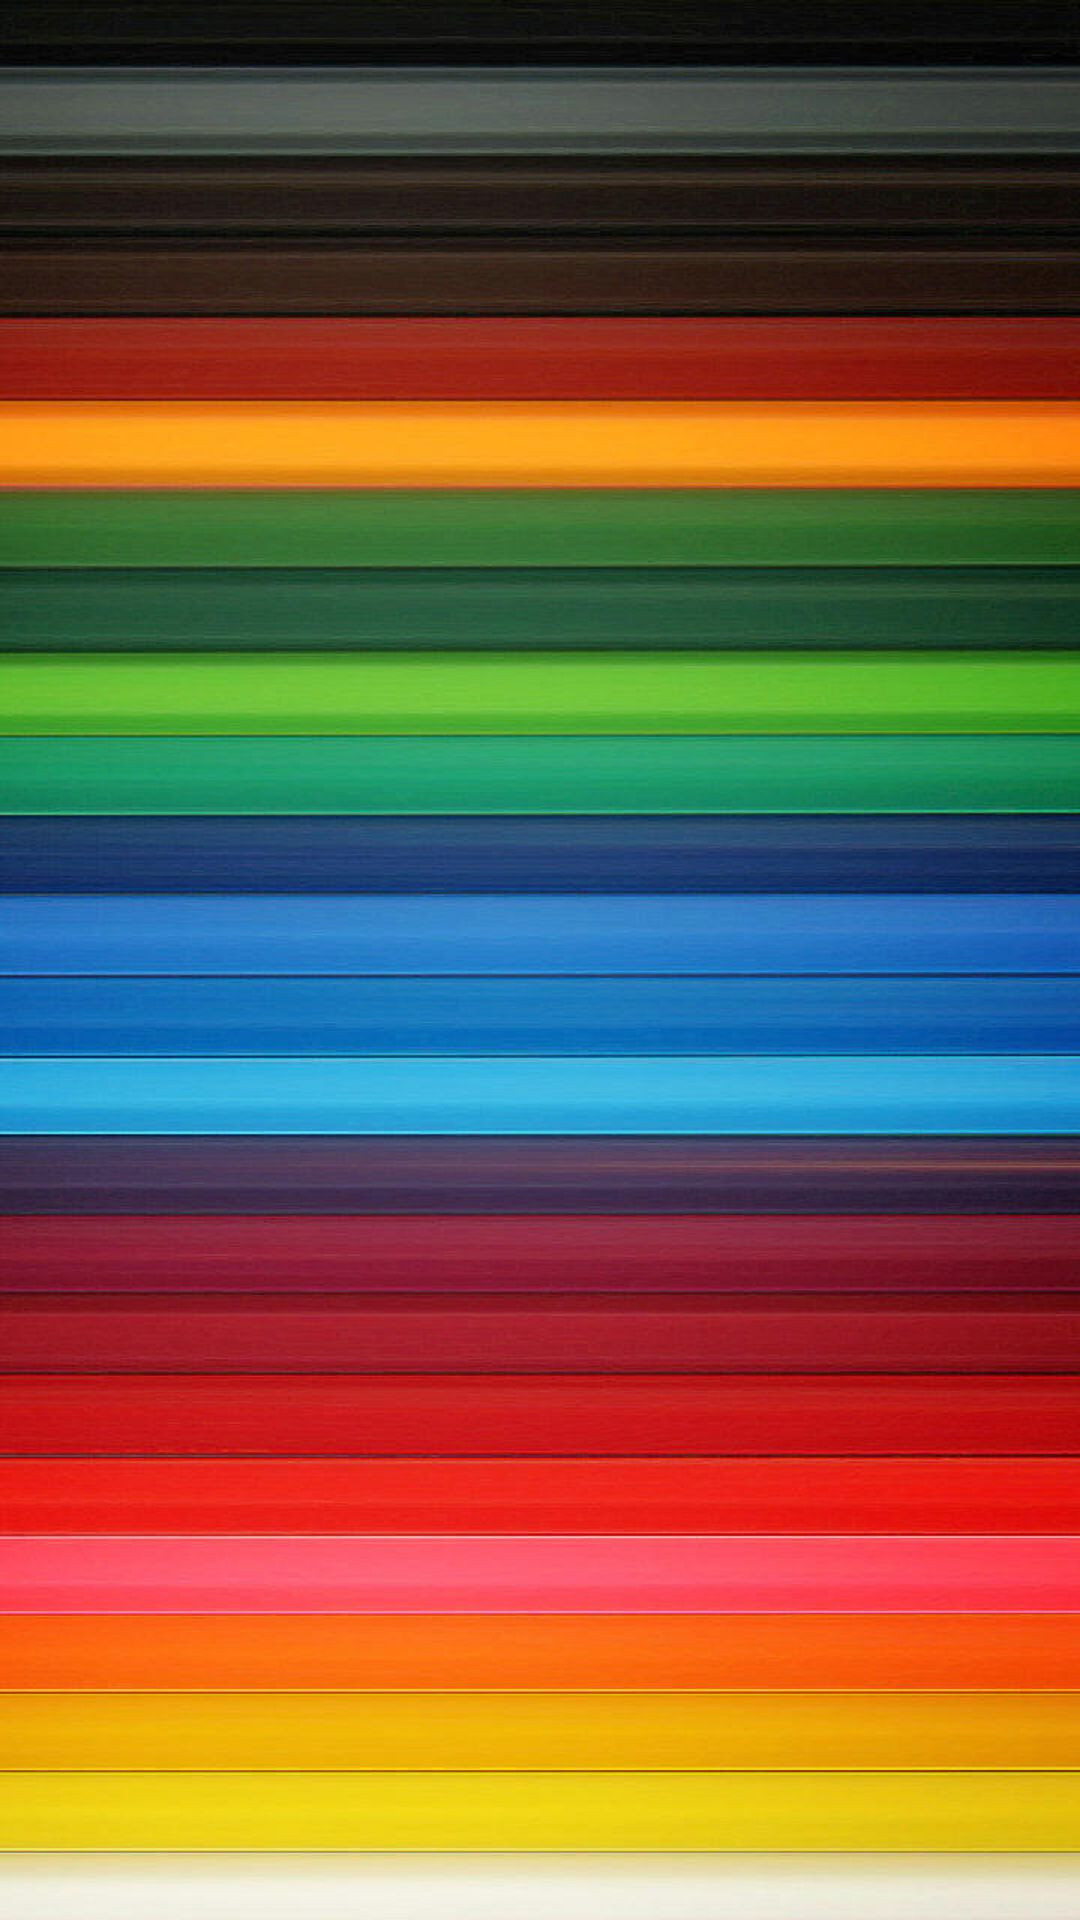 Neon Light Vertical Stripes